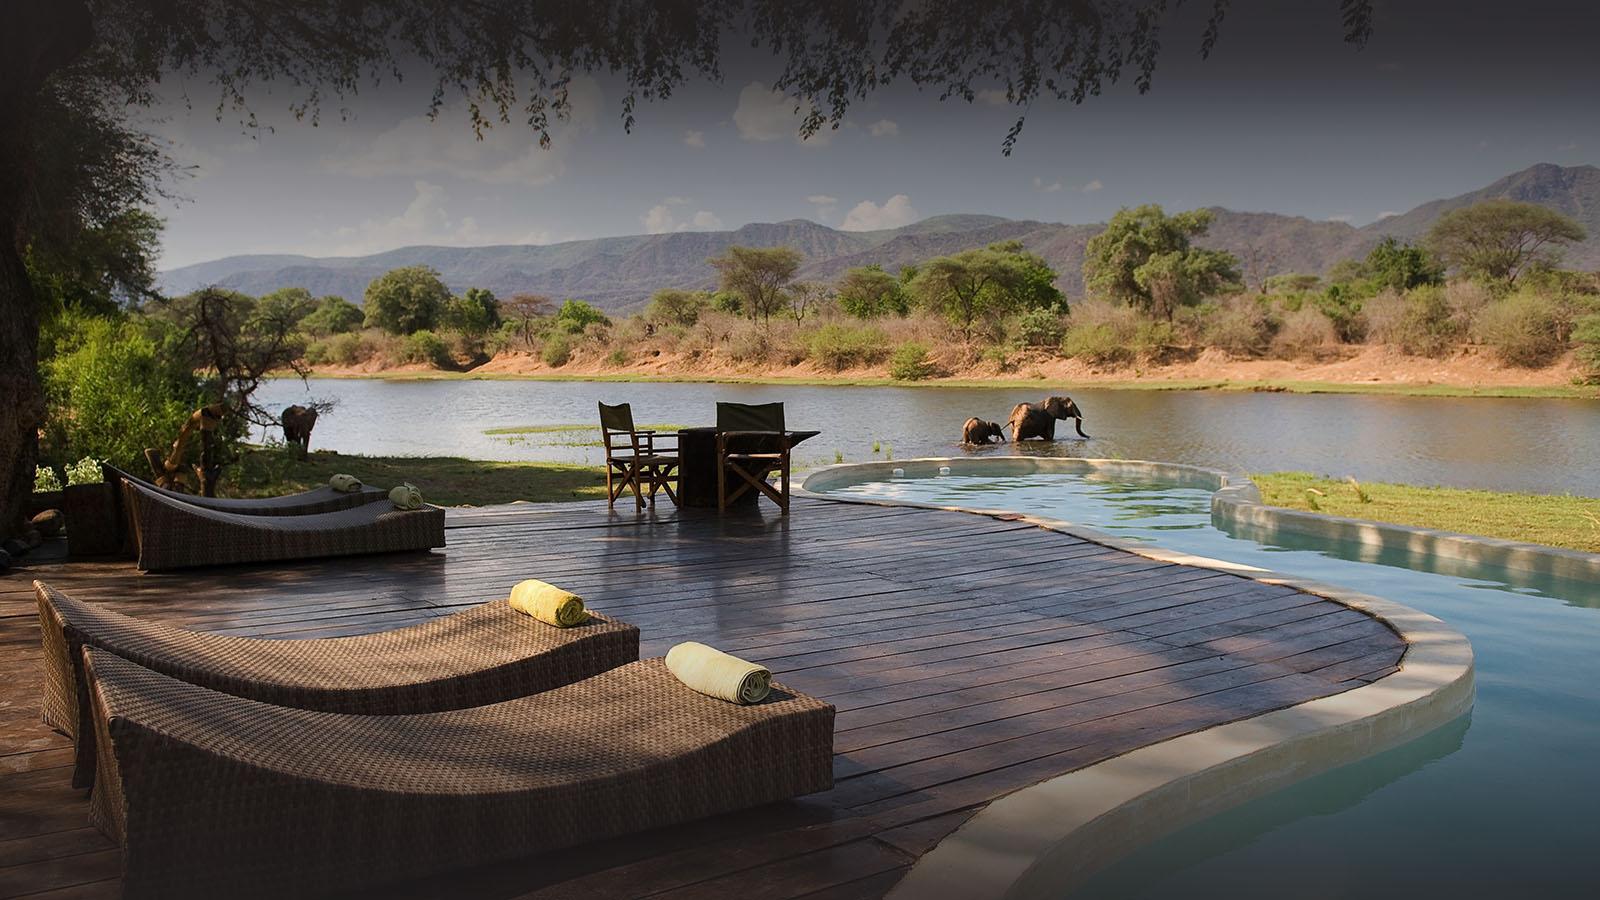 premium-family-adventure-zambia-in-style-safari-packages-tours-luxury-chongwe-safaris-elephants